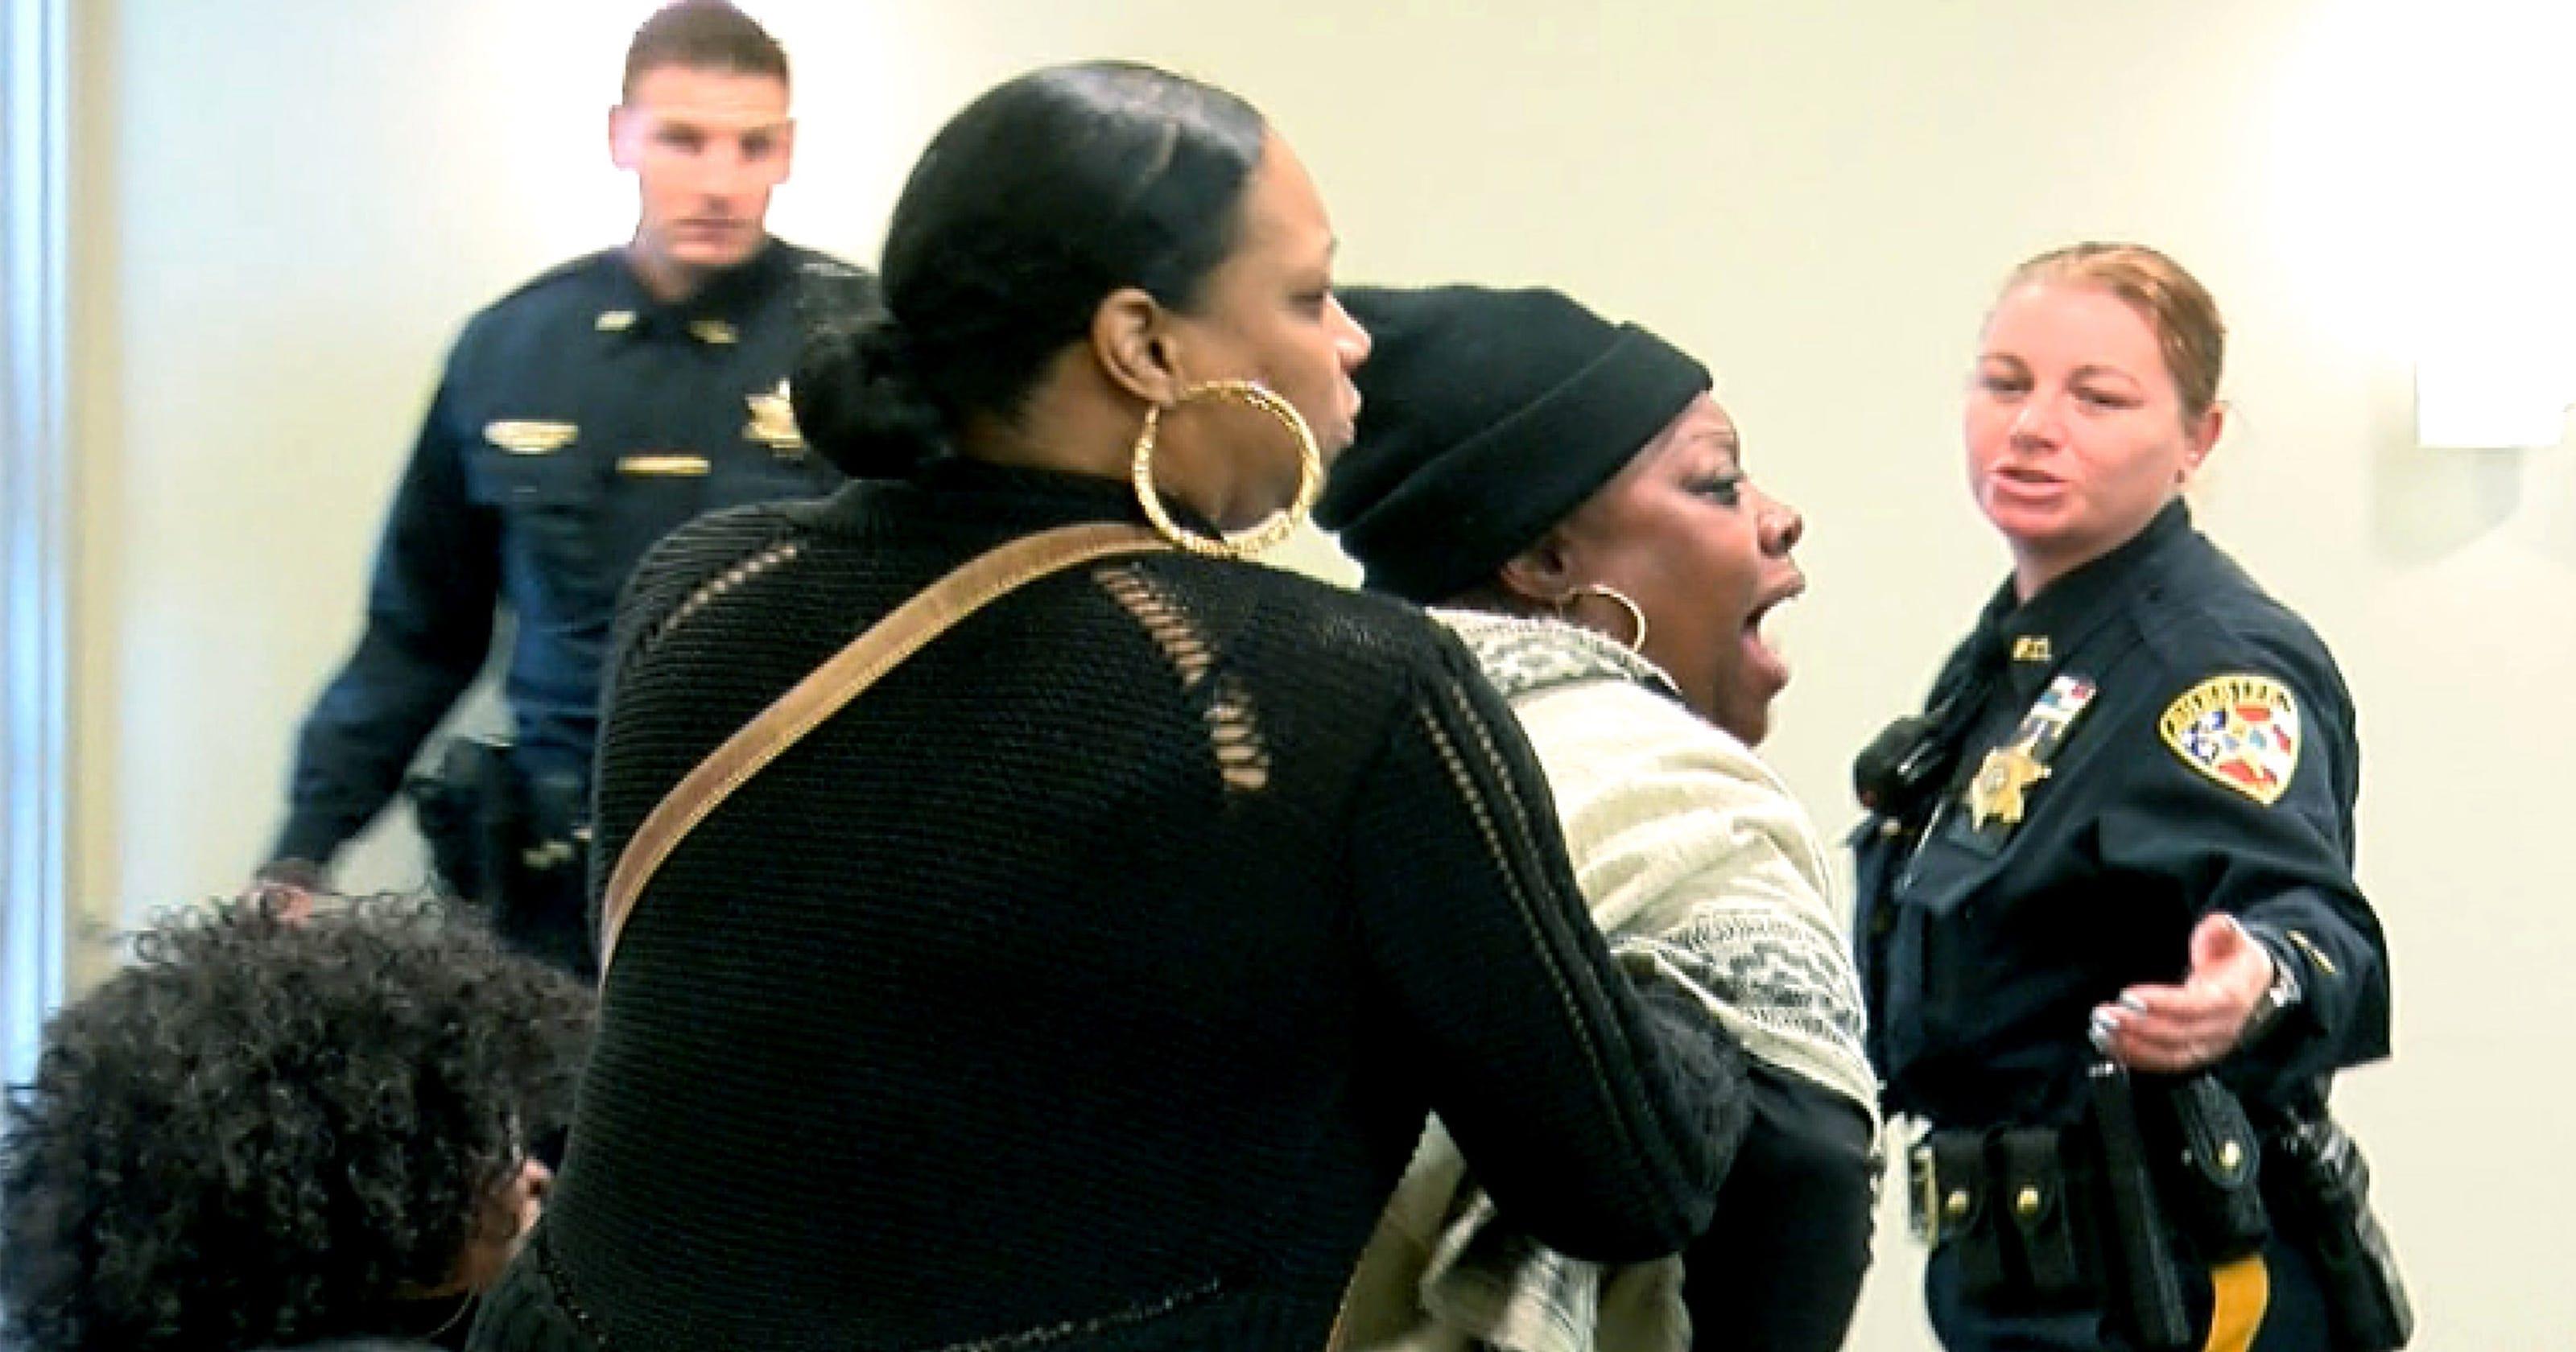 Asbury Park murder: Sobbing wife screams, 'You killed my